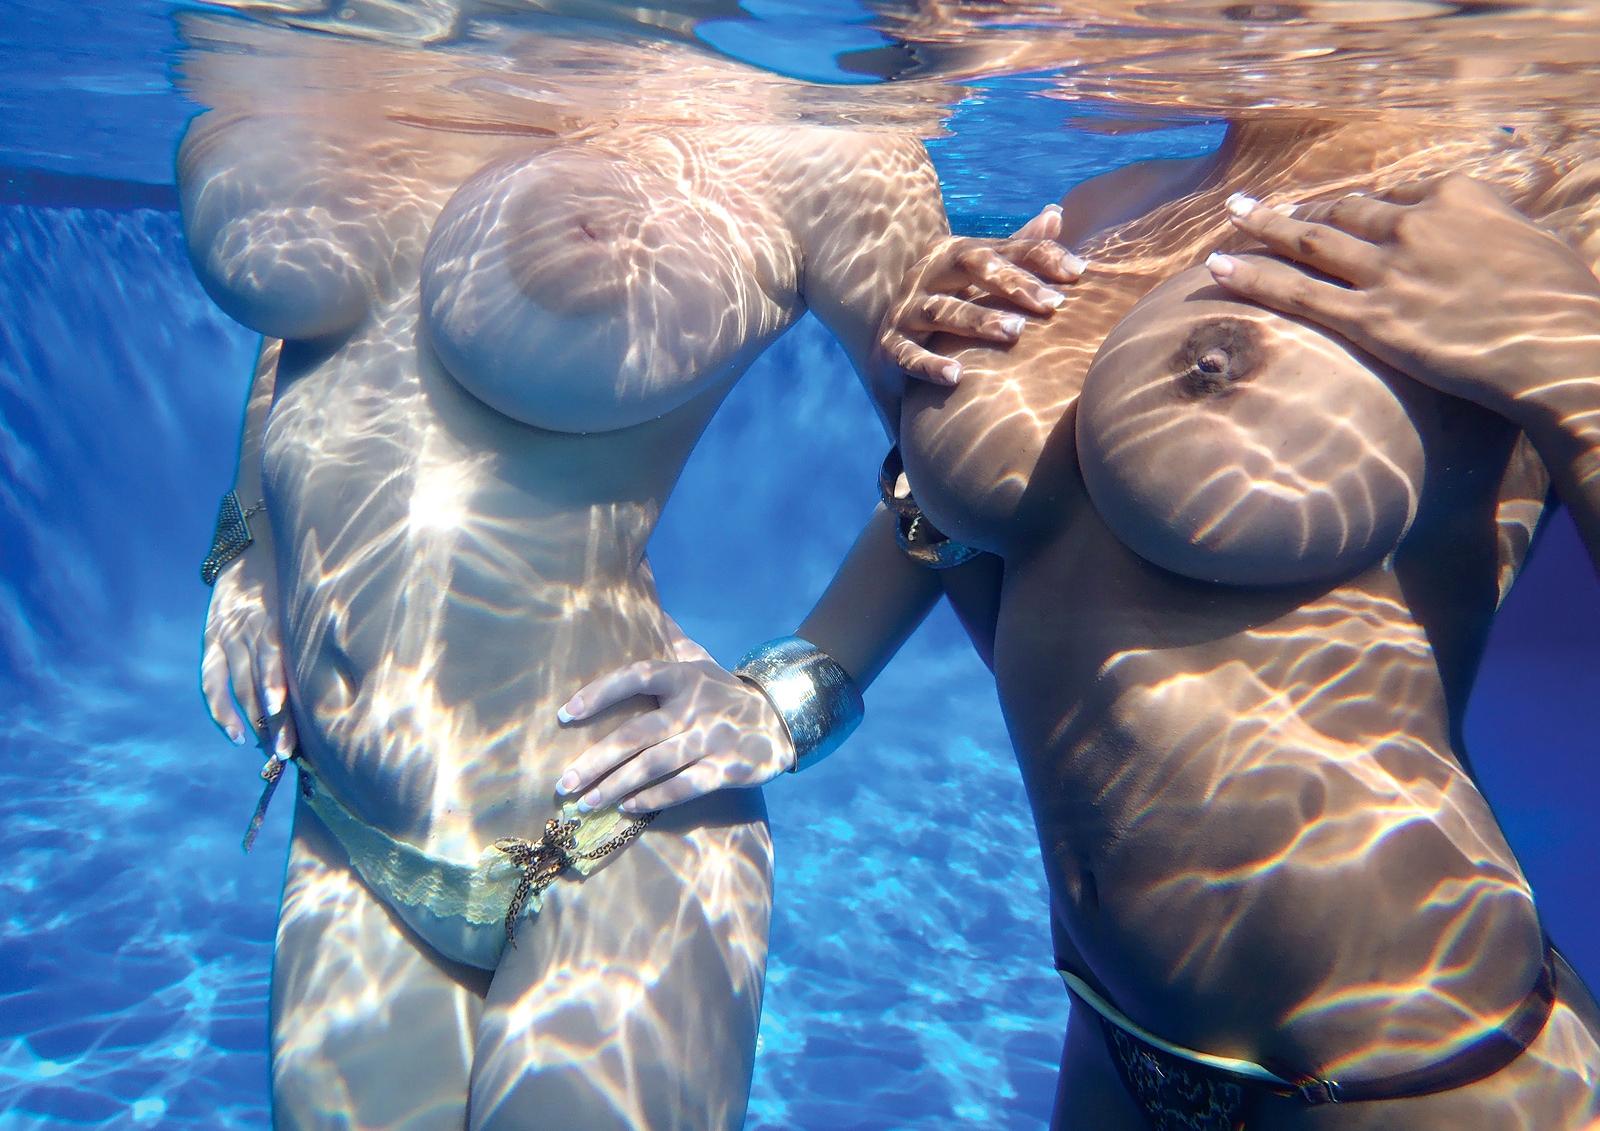 Valory Irene and Chica - Underwater tits